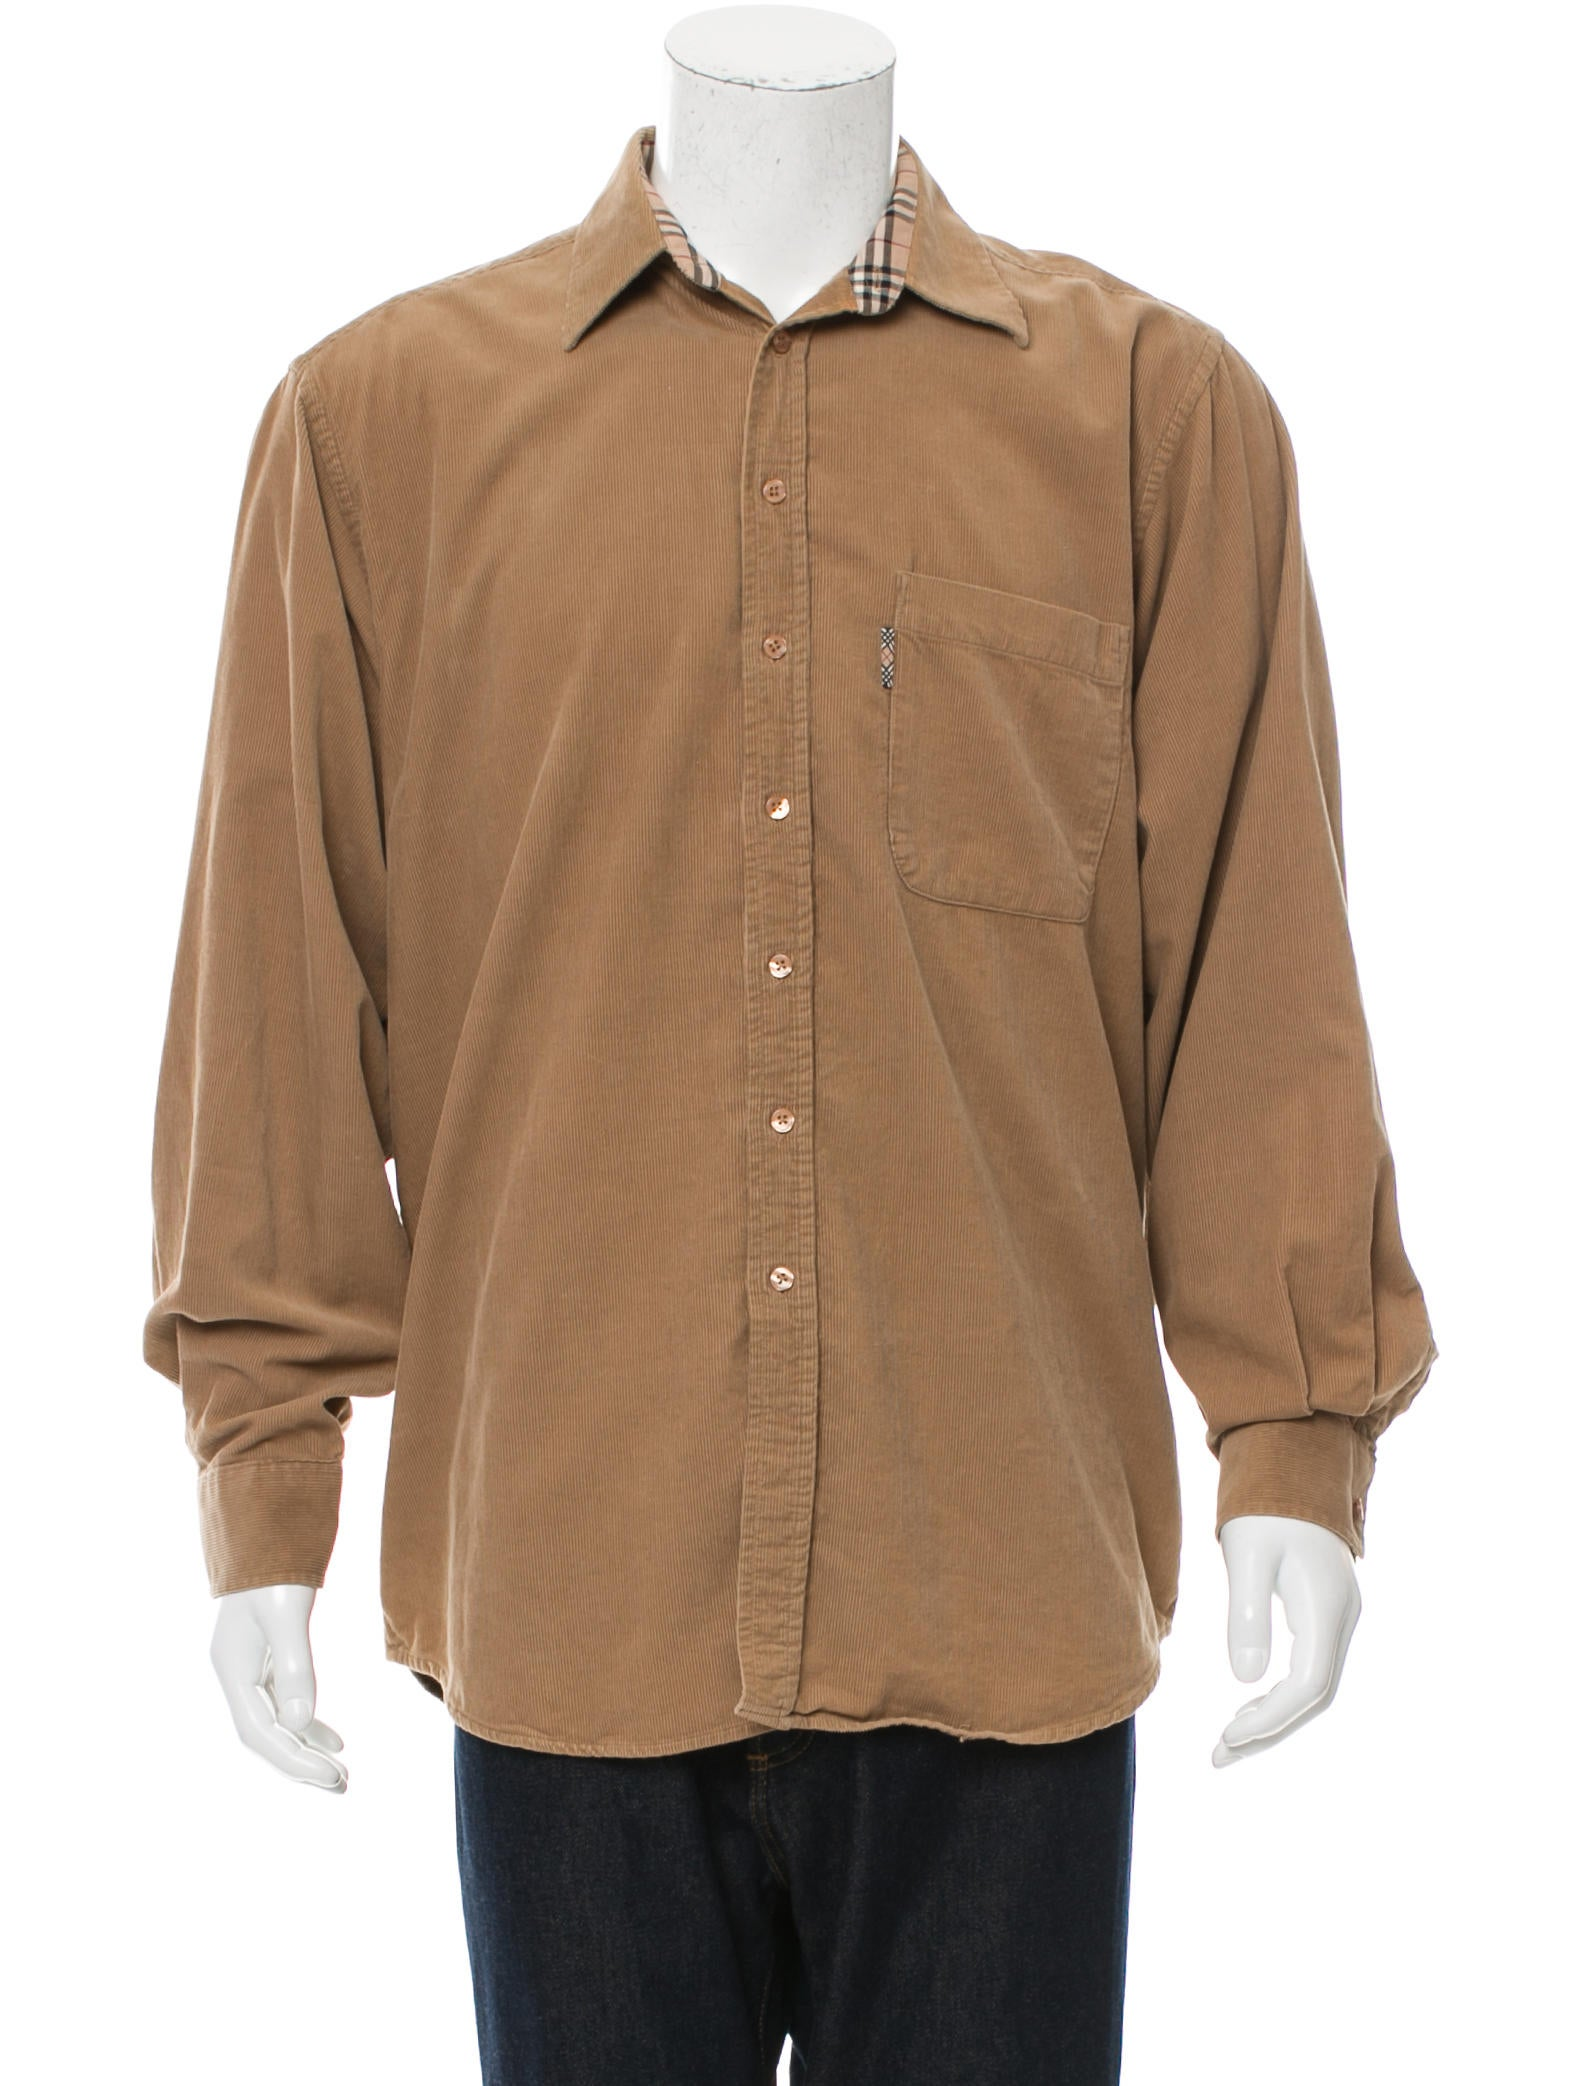 Burberry London Corduroy Button Up Shirt Clothing